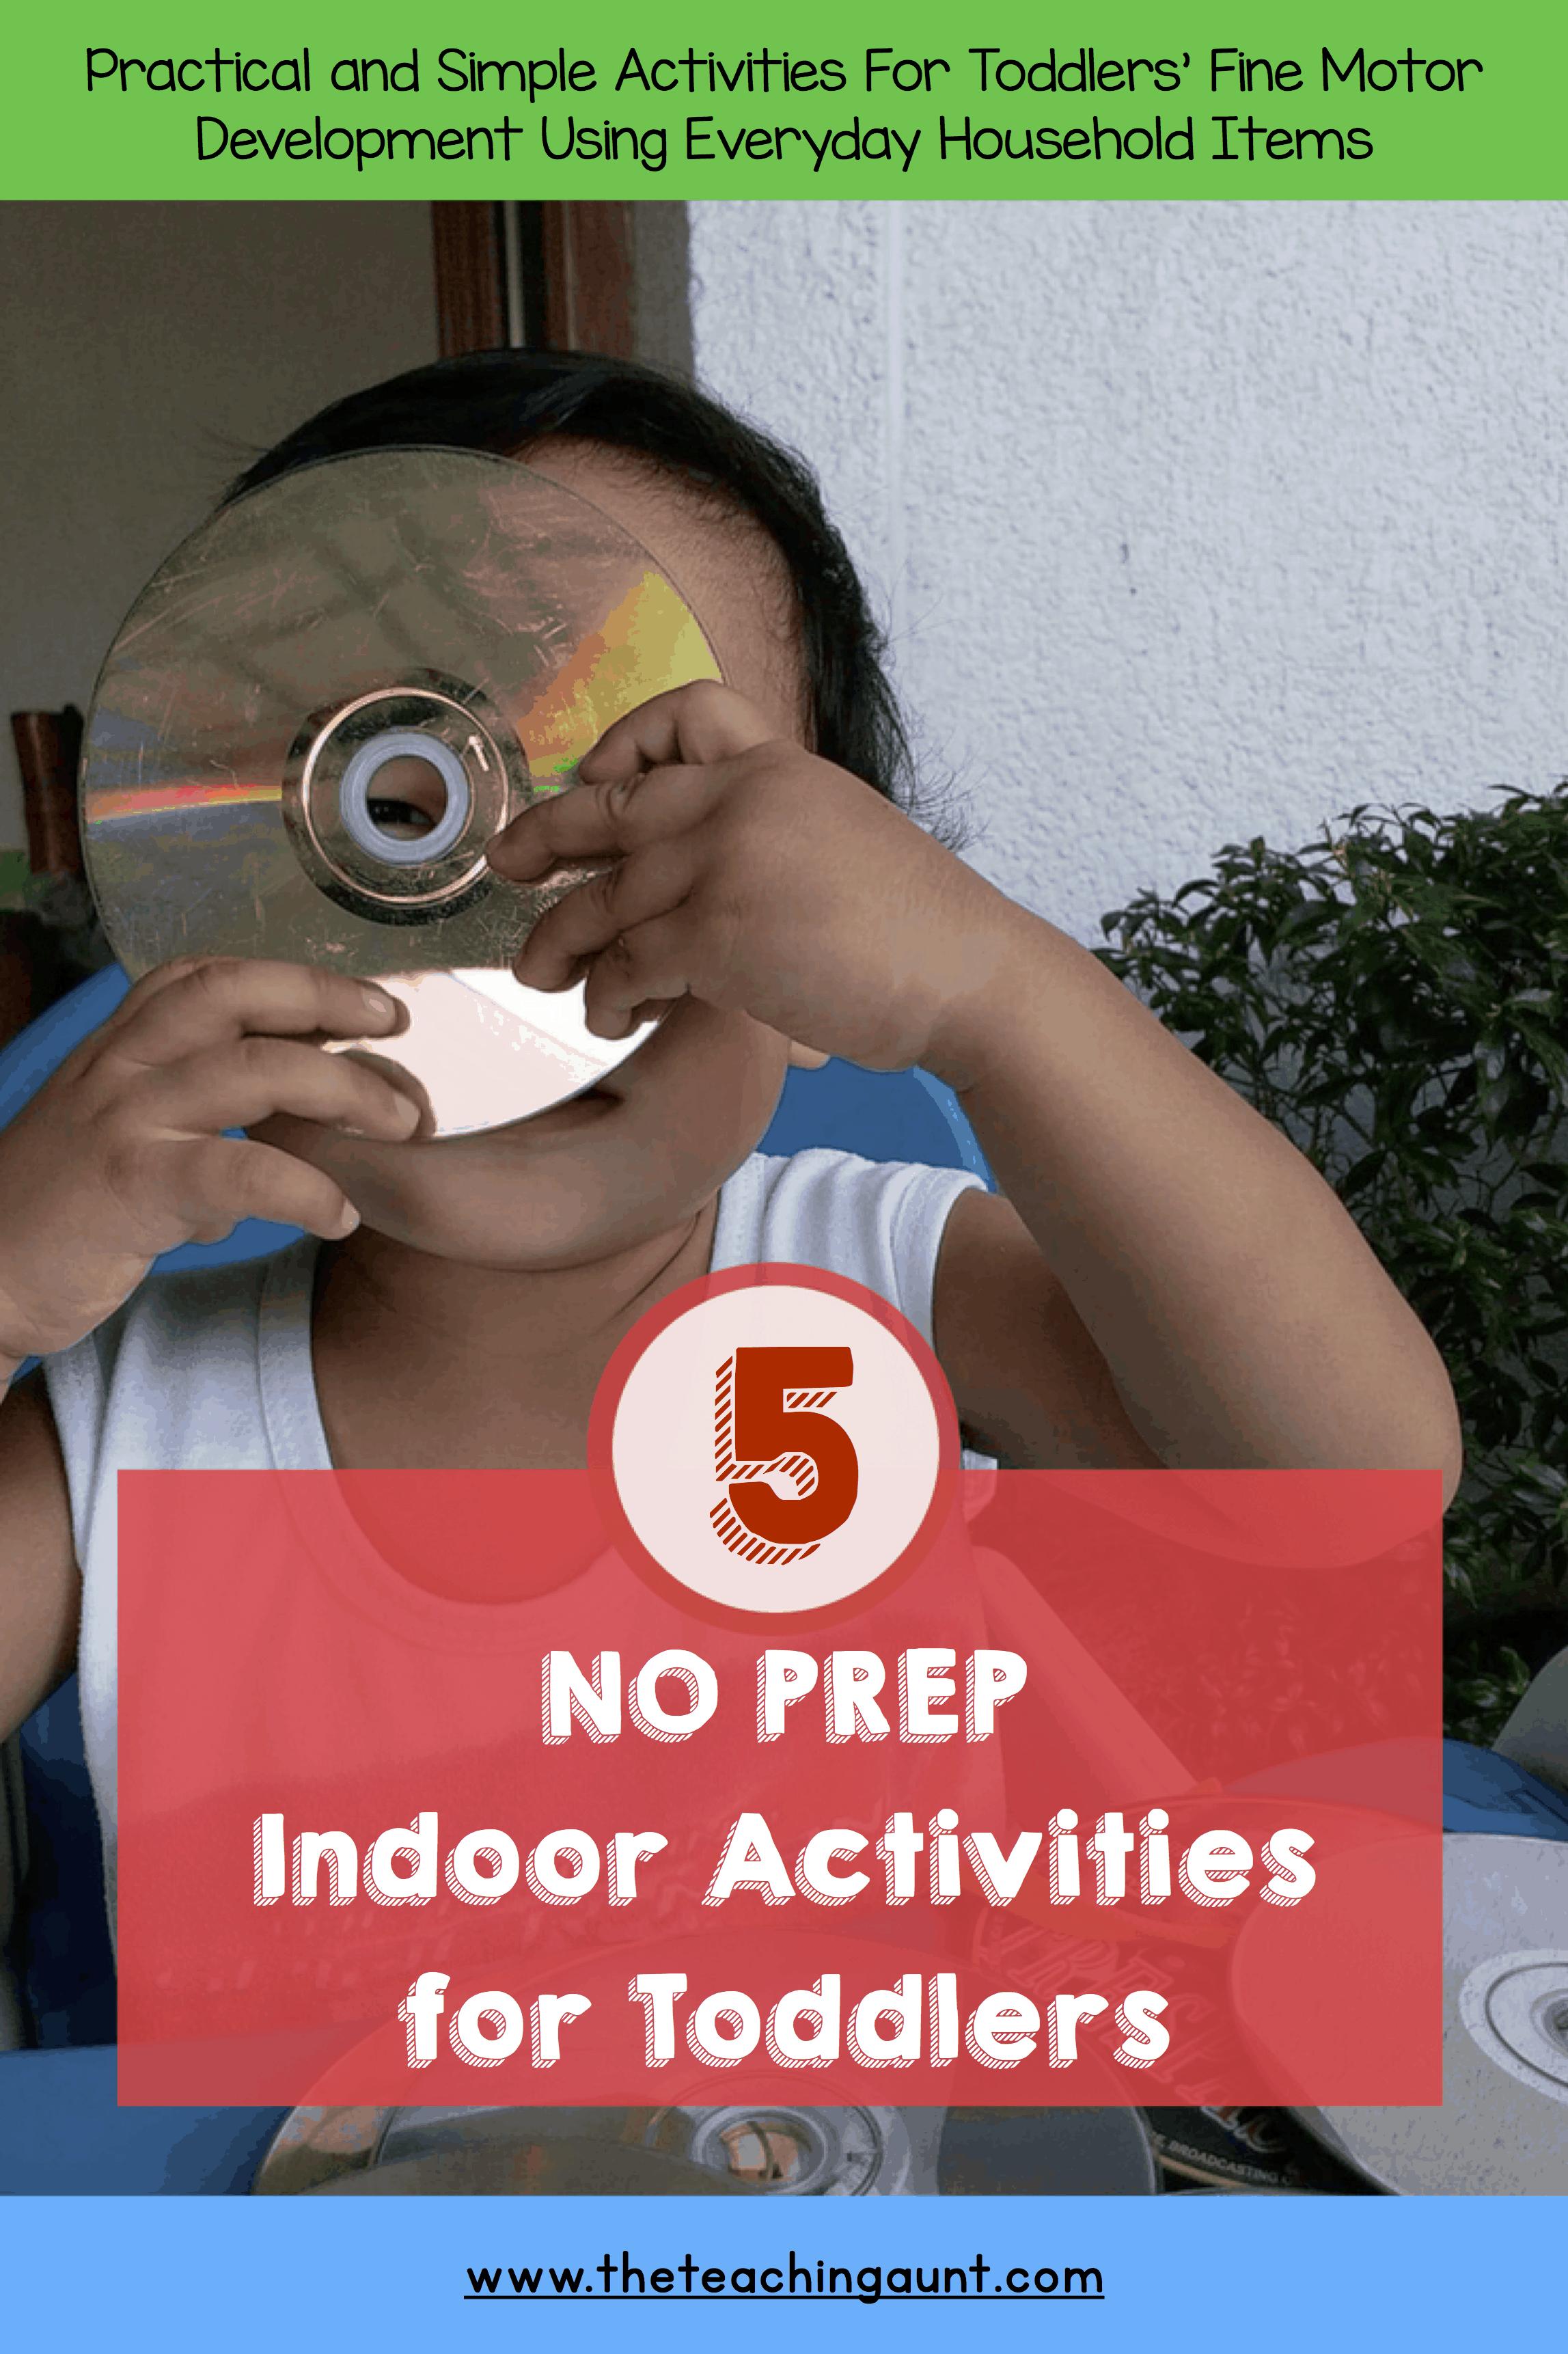 5 NO PREP Indoor Activities for Toddlers P1